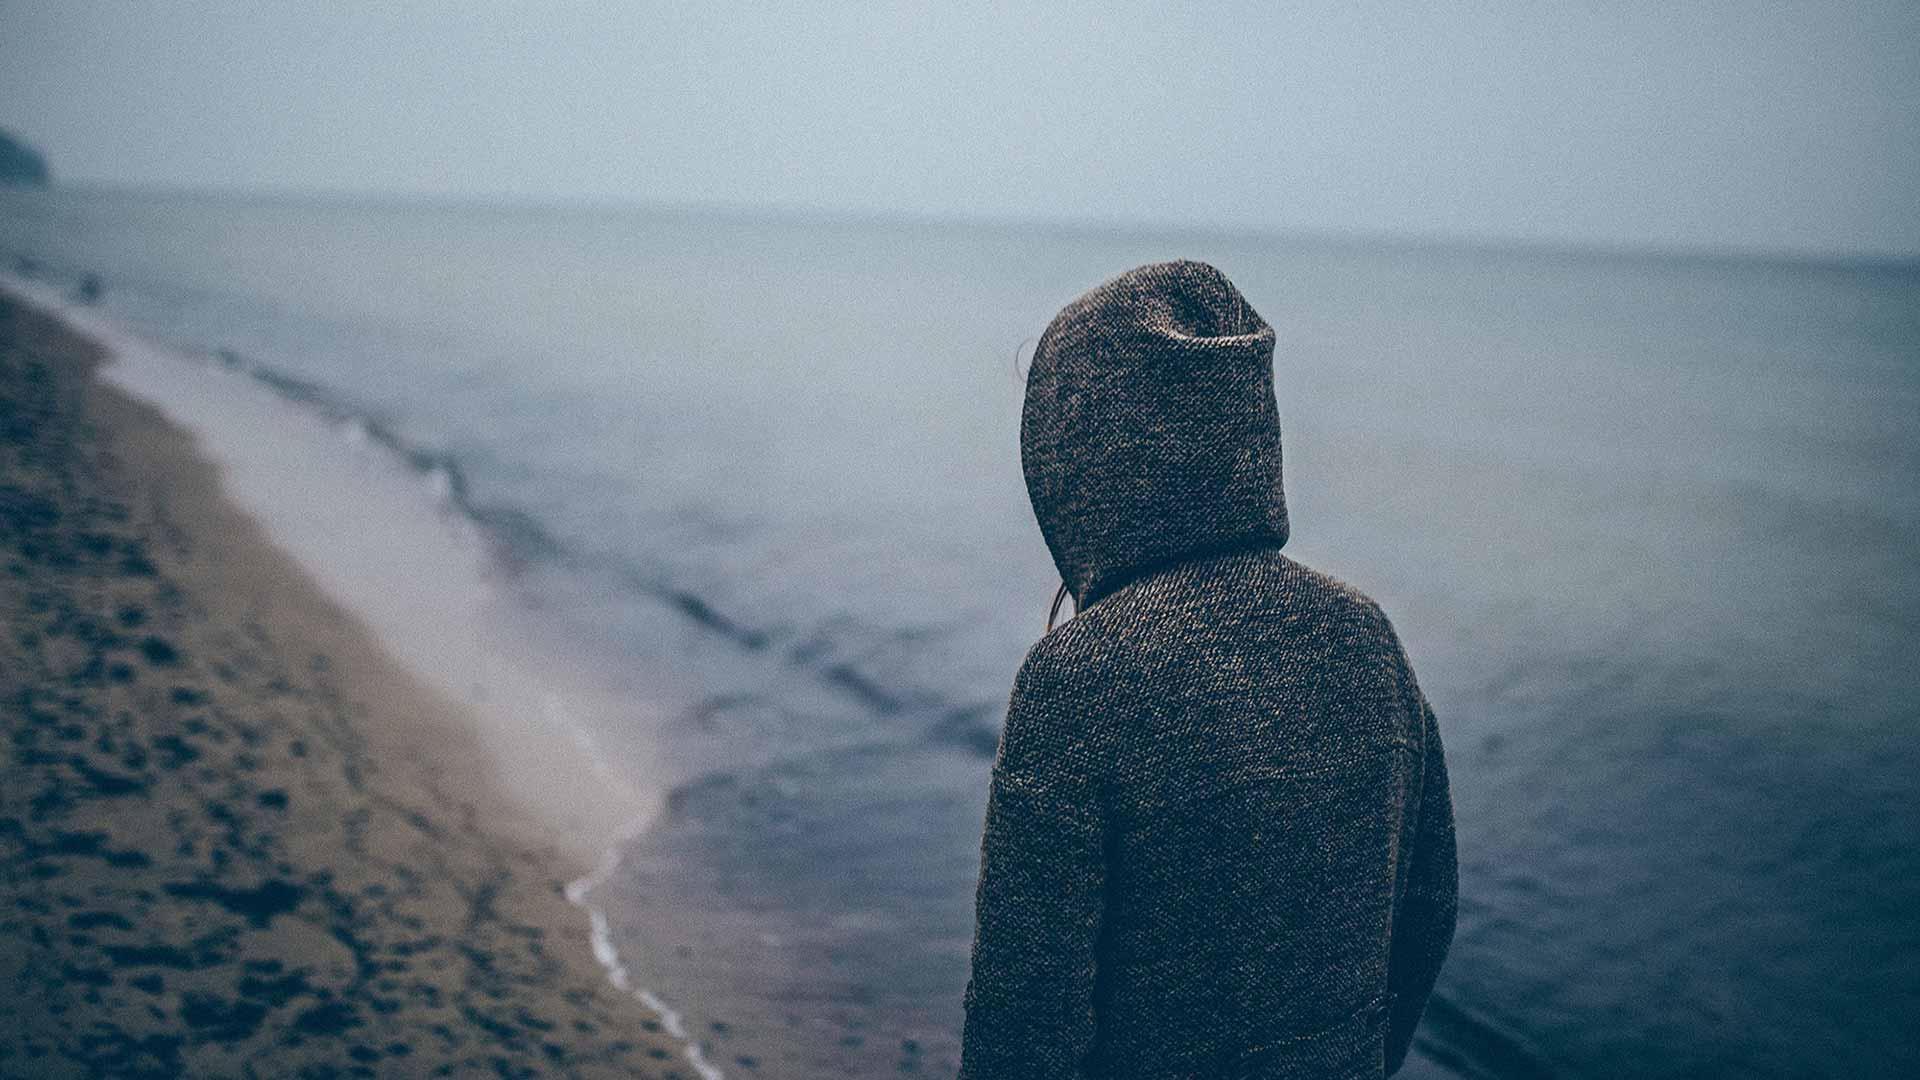 Sad person overlooking ocean alone